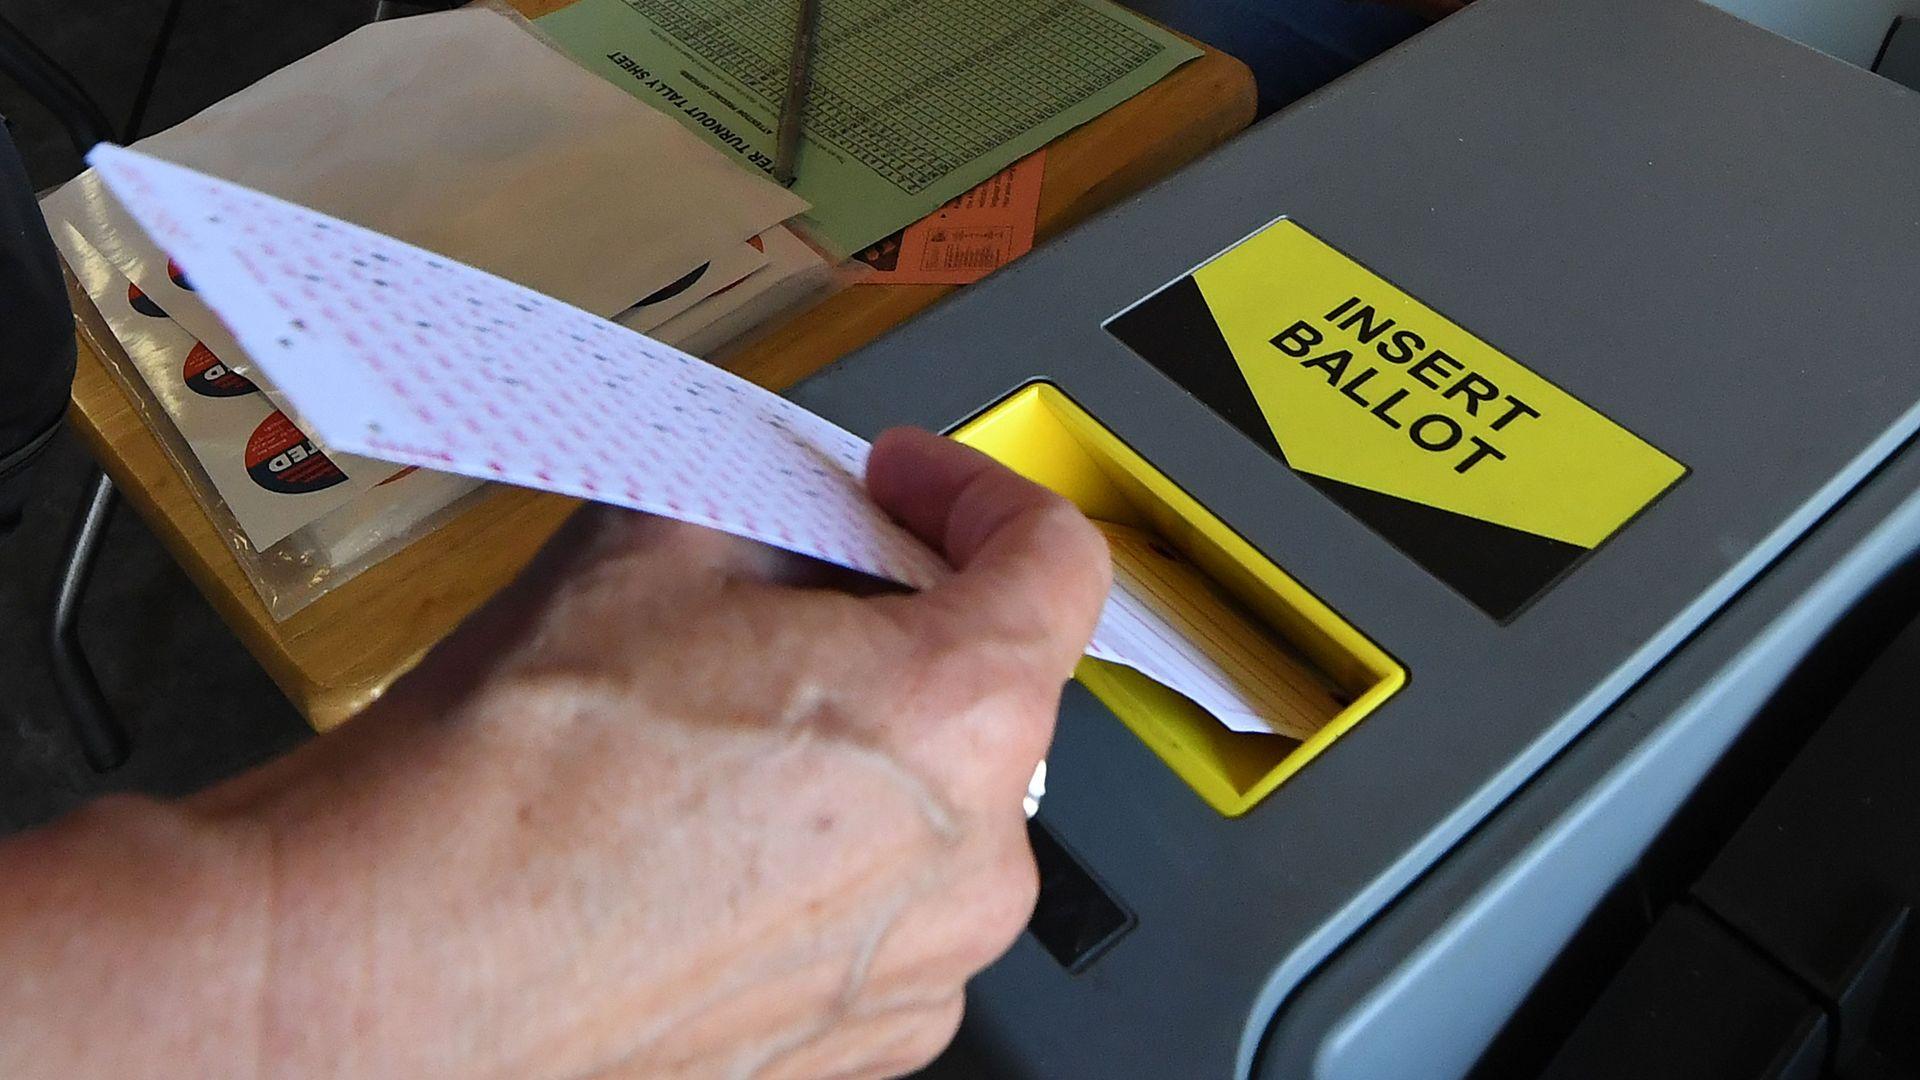 A woman puts a ballot into a scanning machine